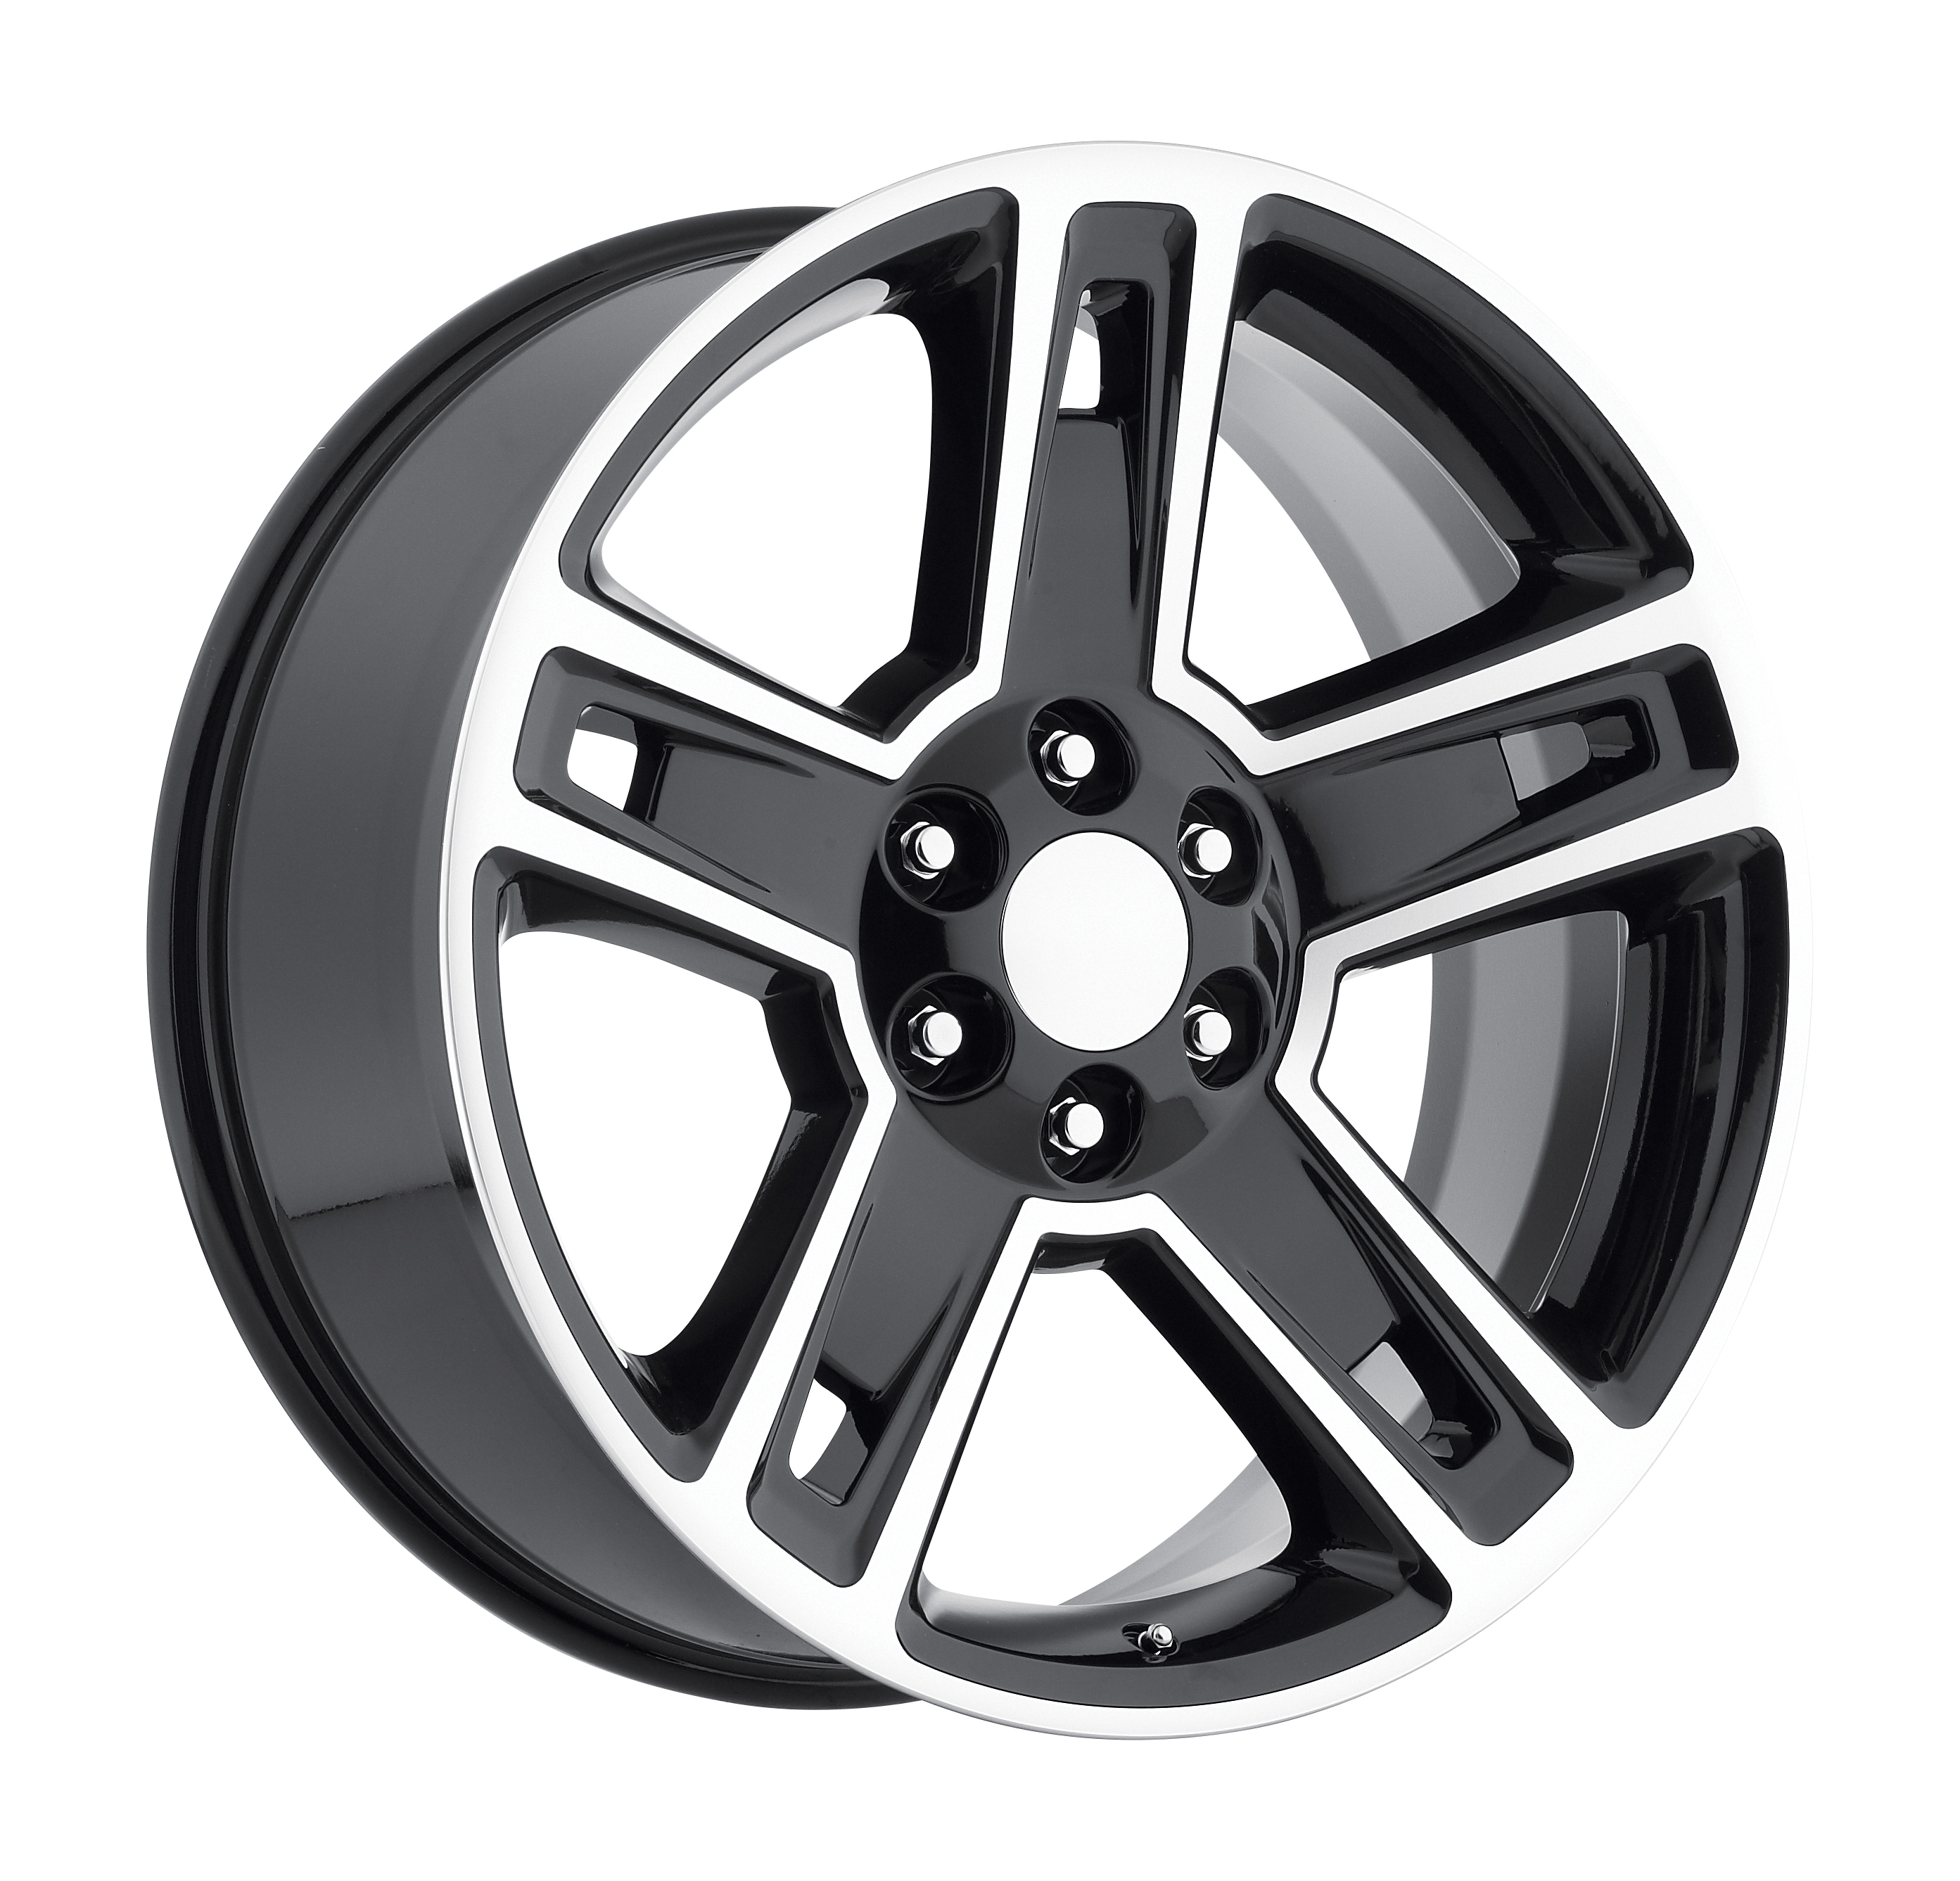 2015 Chevrolet Silverado 1500 Black Machined Face Replicas